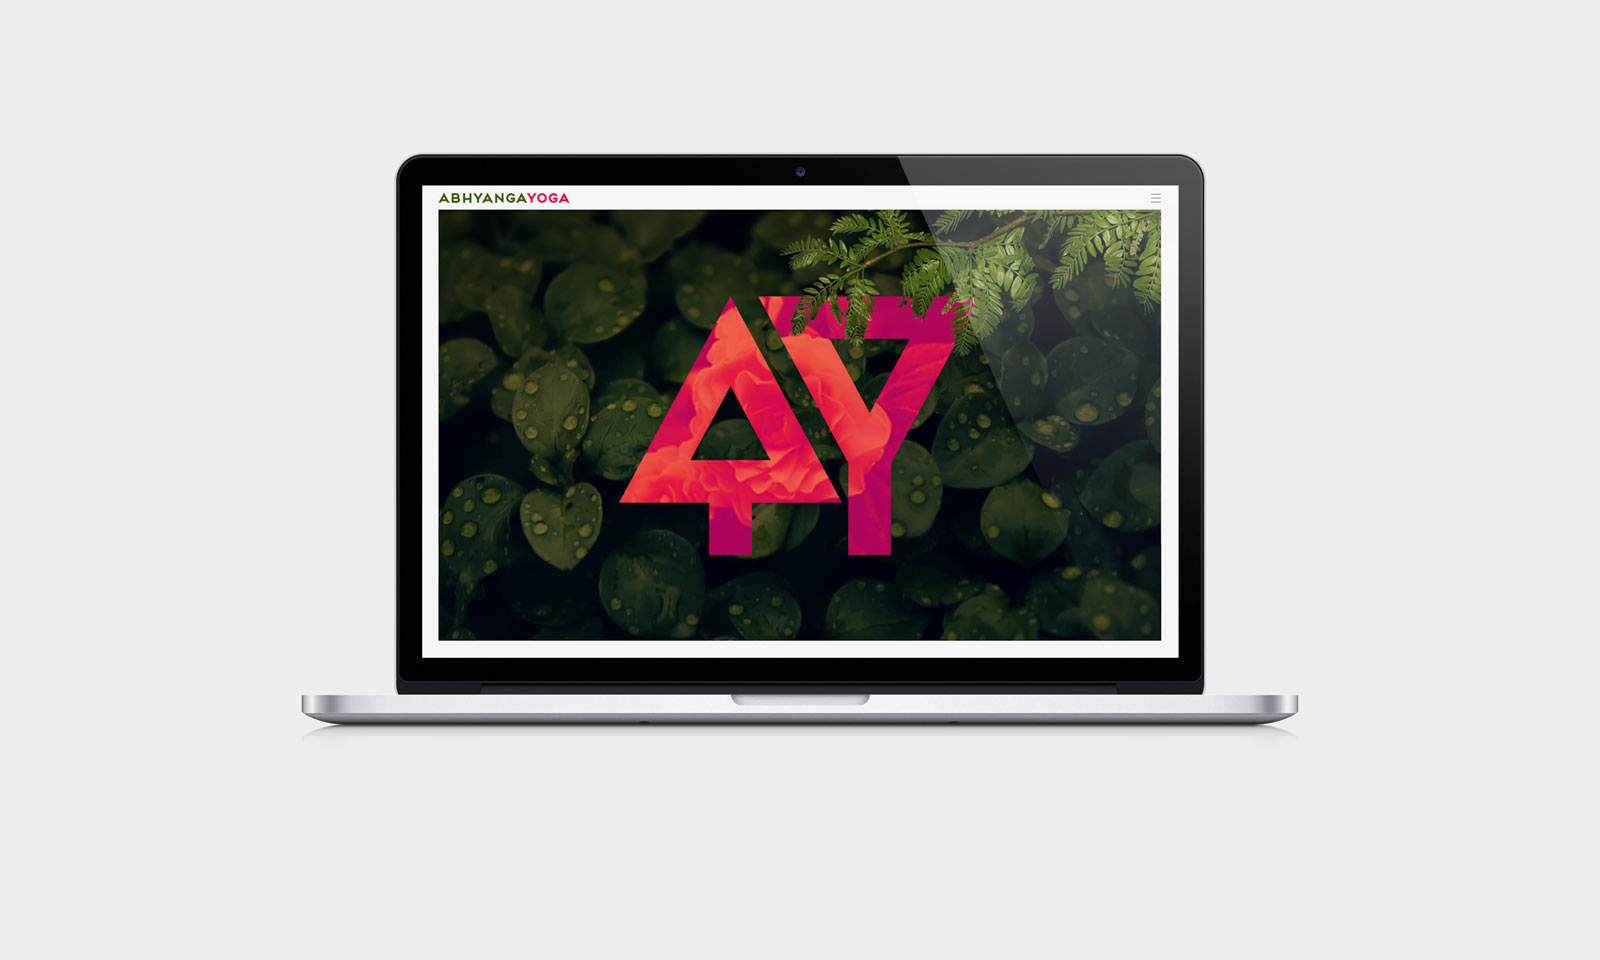 abhyanga-ypga-web-06